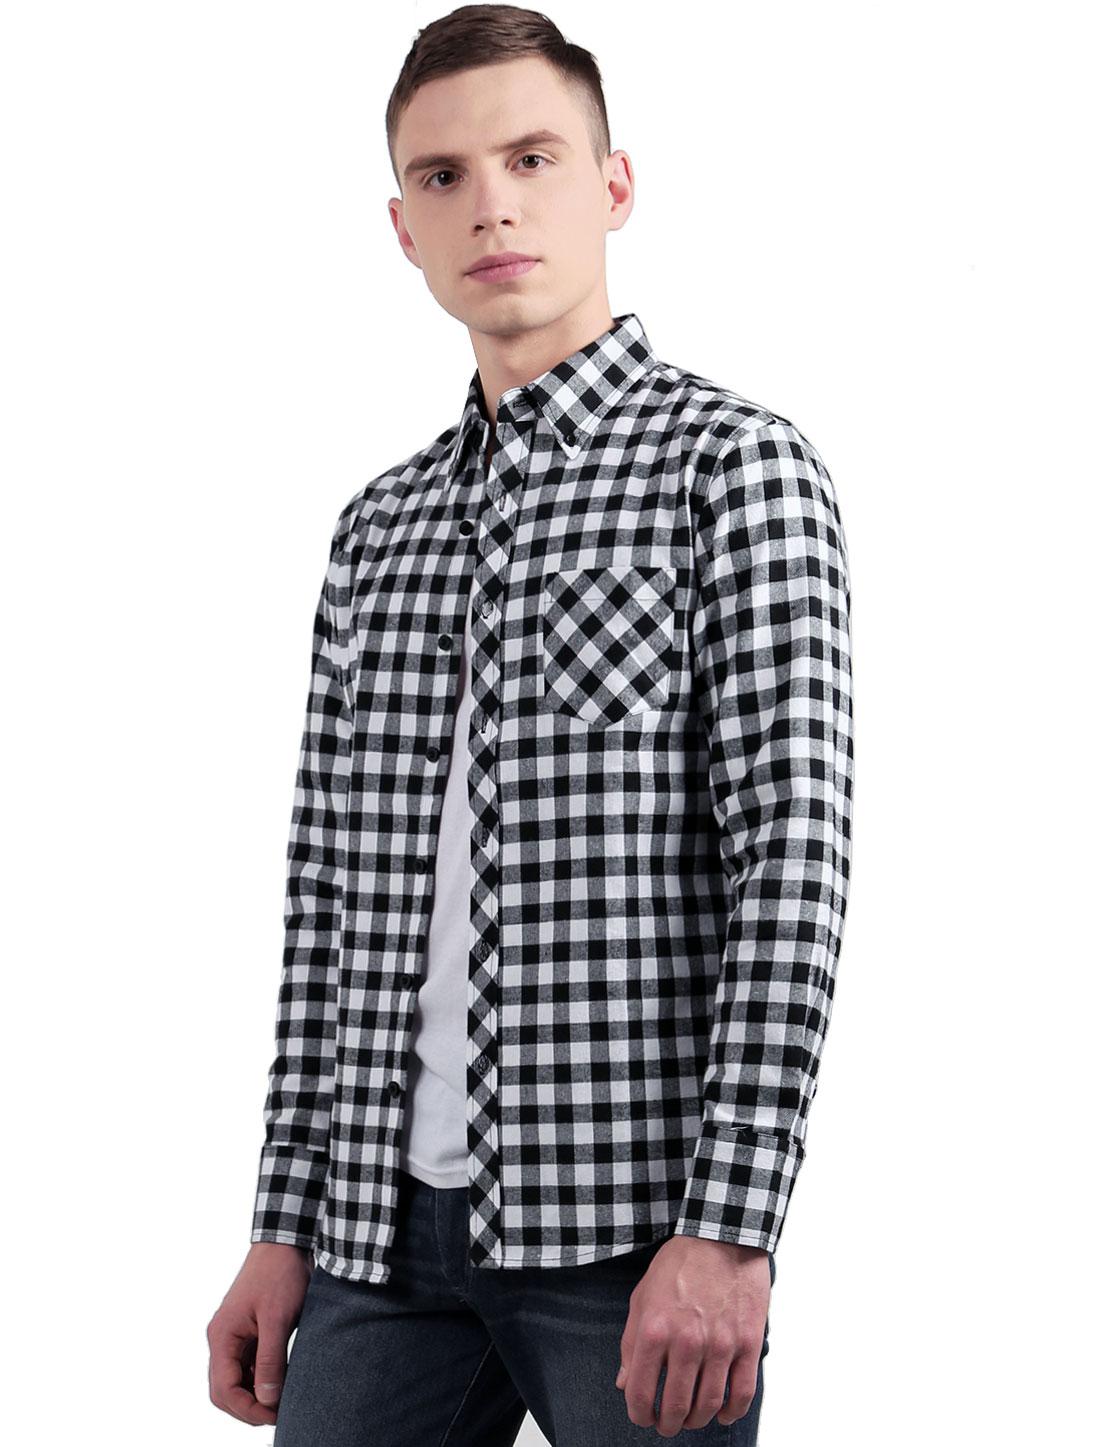 Men Pocket Point Collar Plaids Long Sleeves Button Down Shirt Black White L